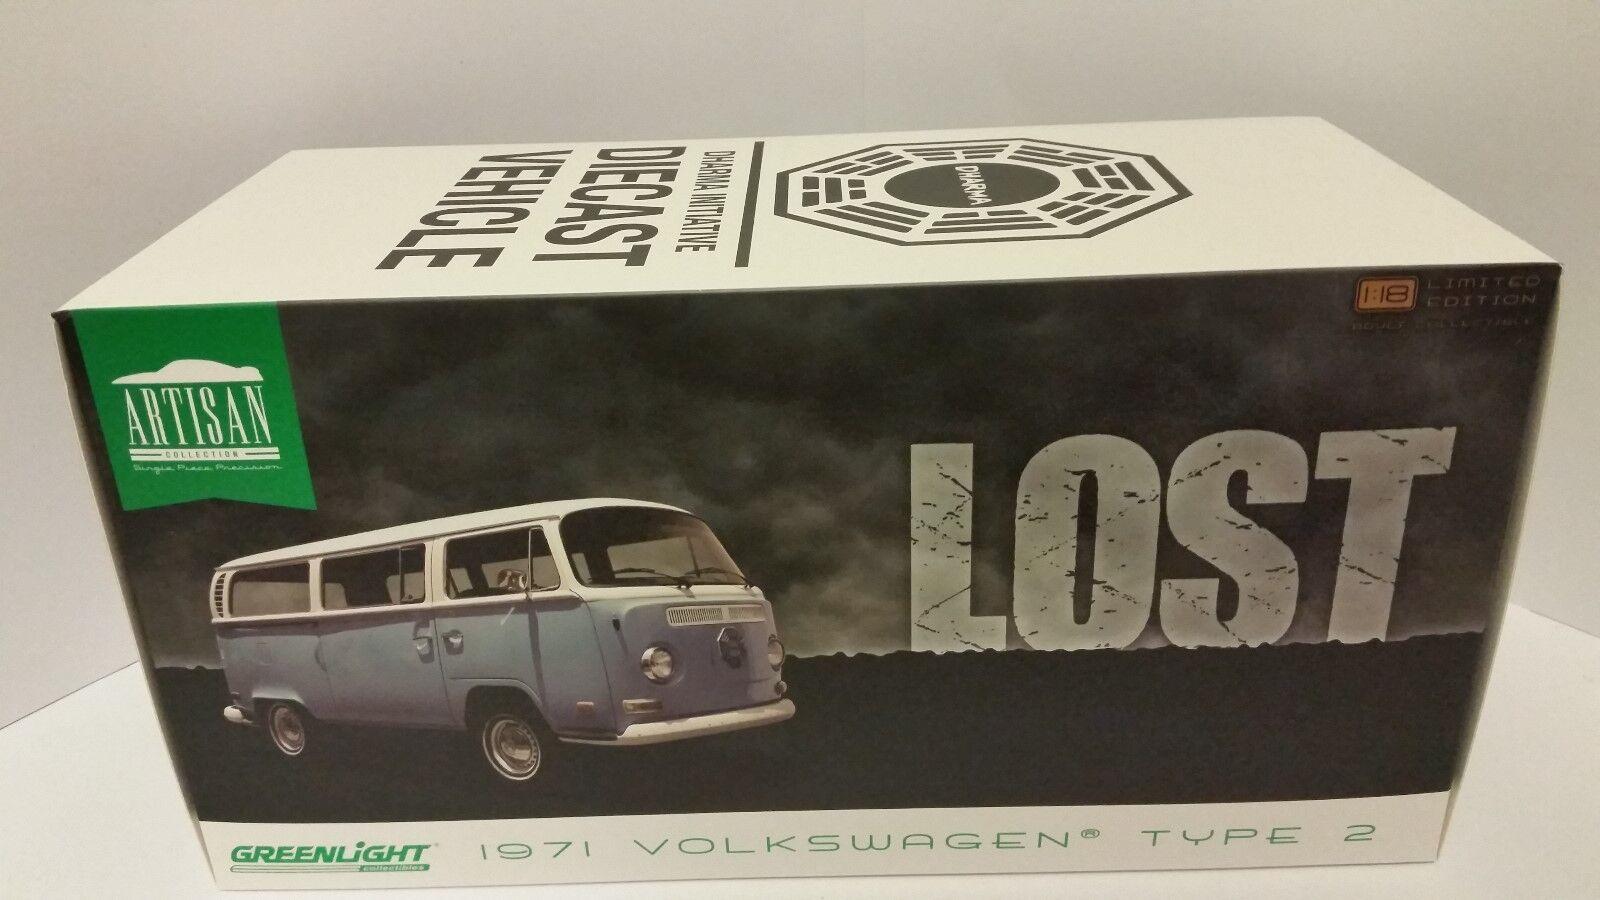 Greenlight lost volkswagen 1971 type 2 campervan 1 18th diecast